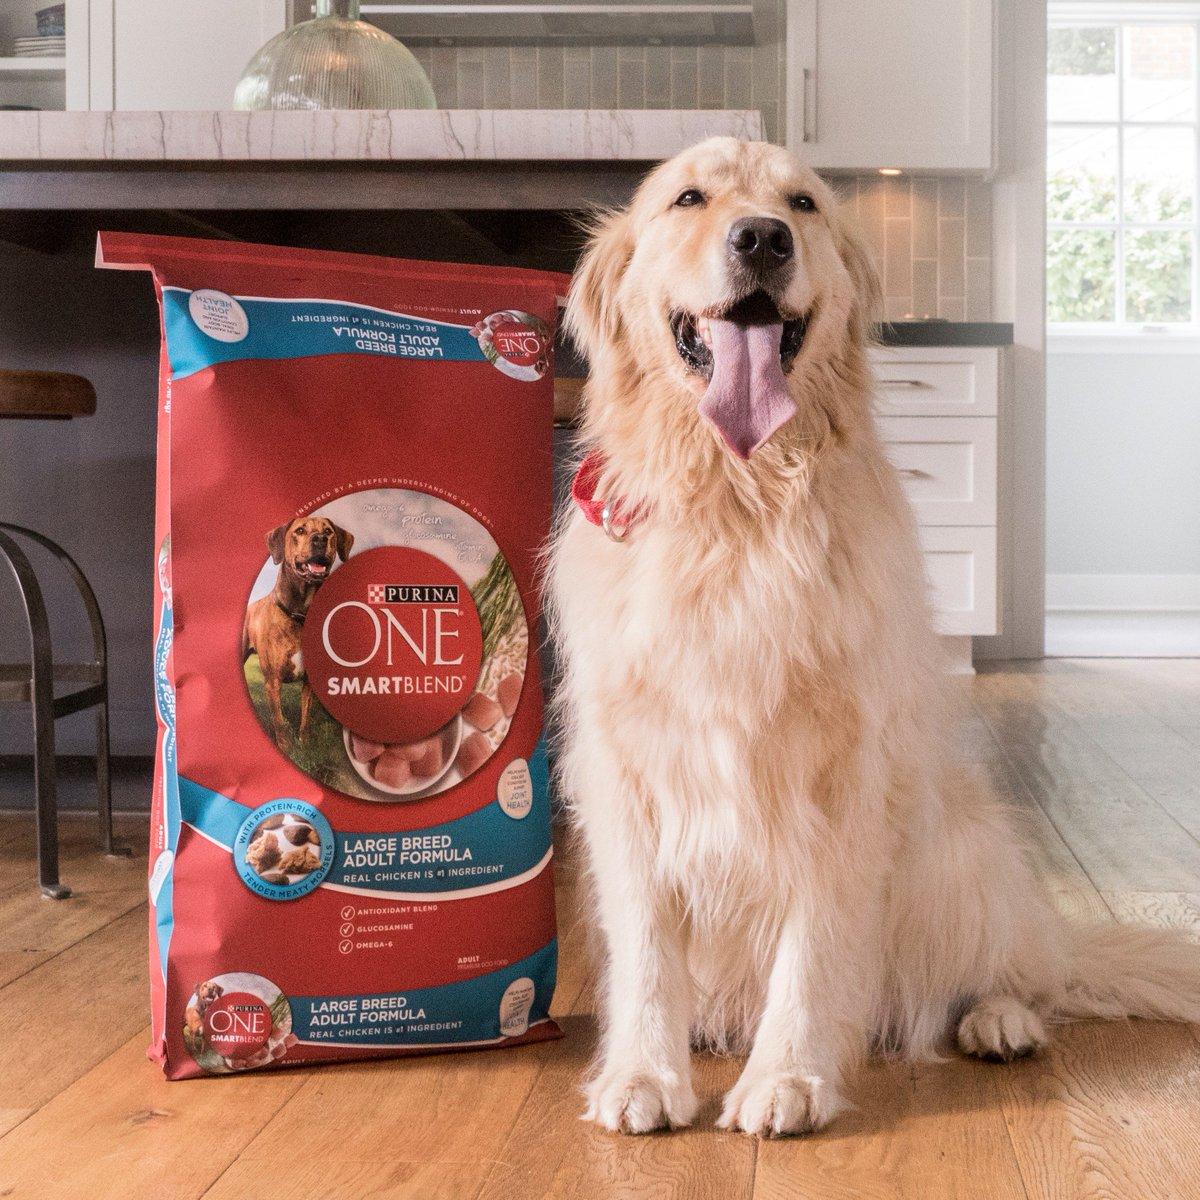 Purina One Dog On Twitter Get 3 Off Purina One Dog Food